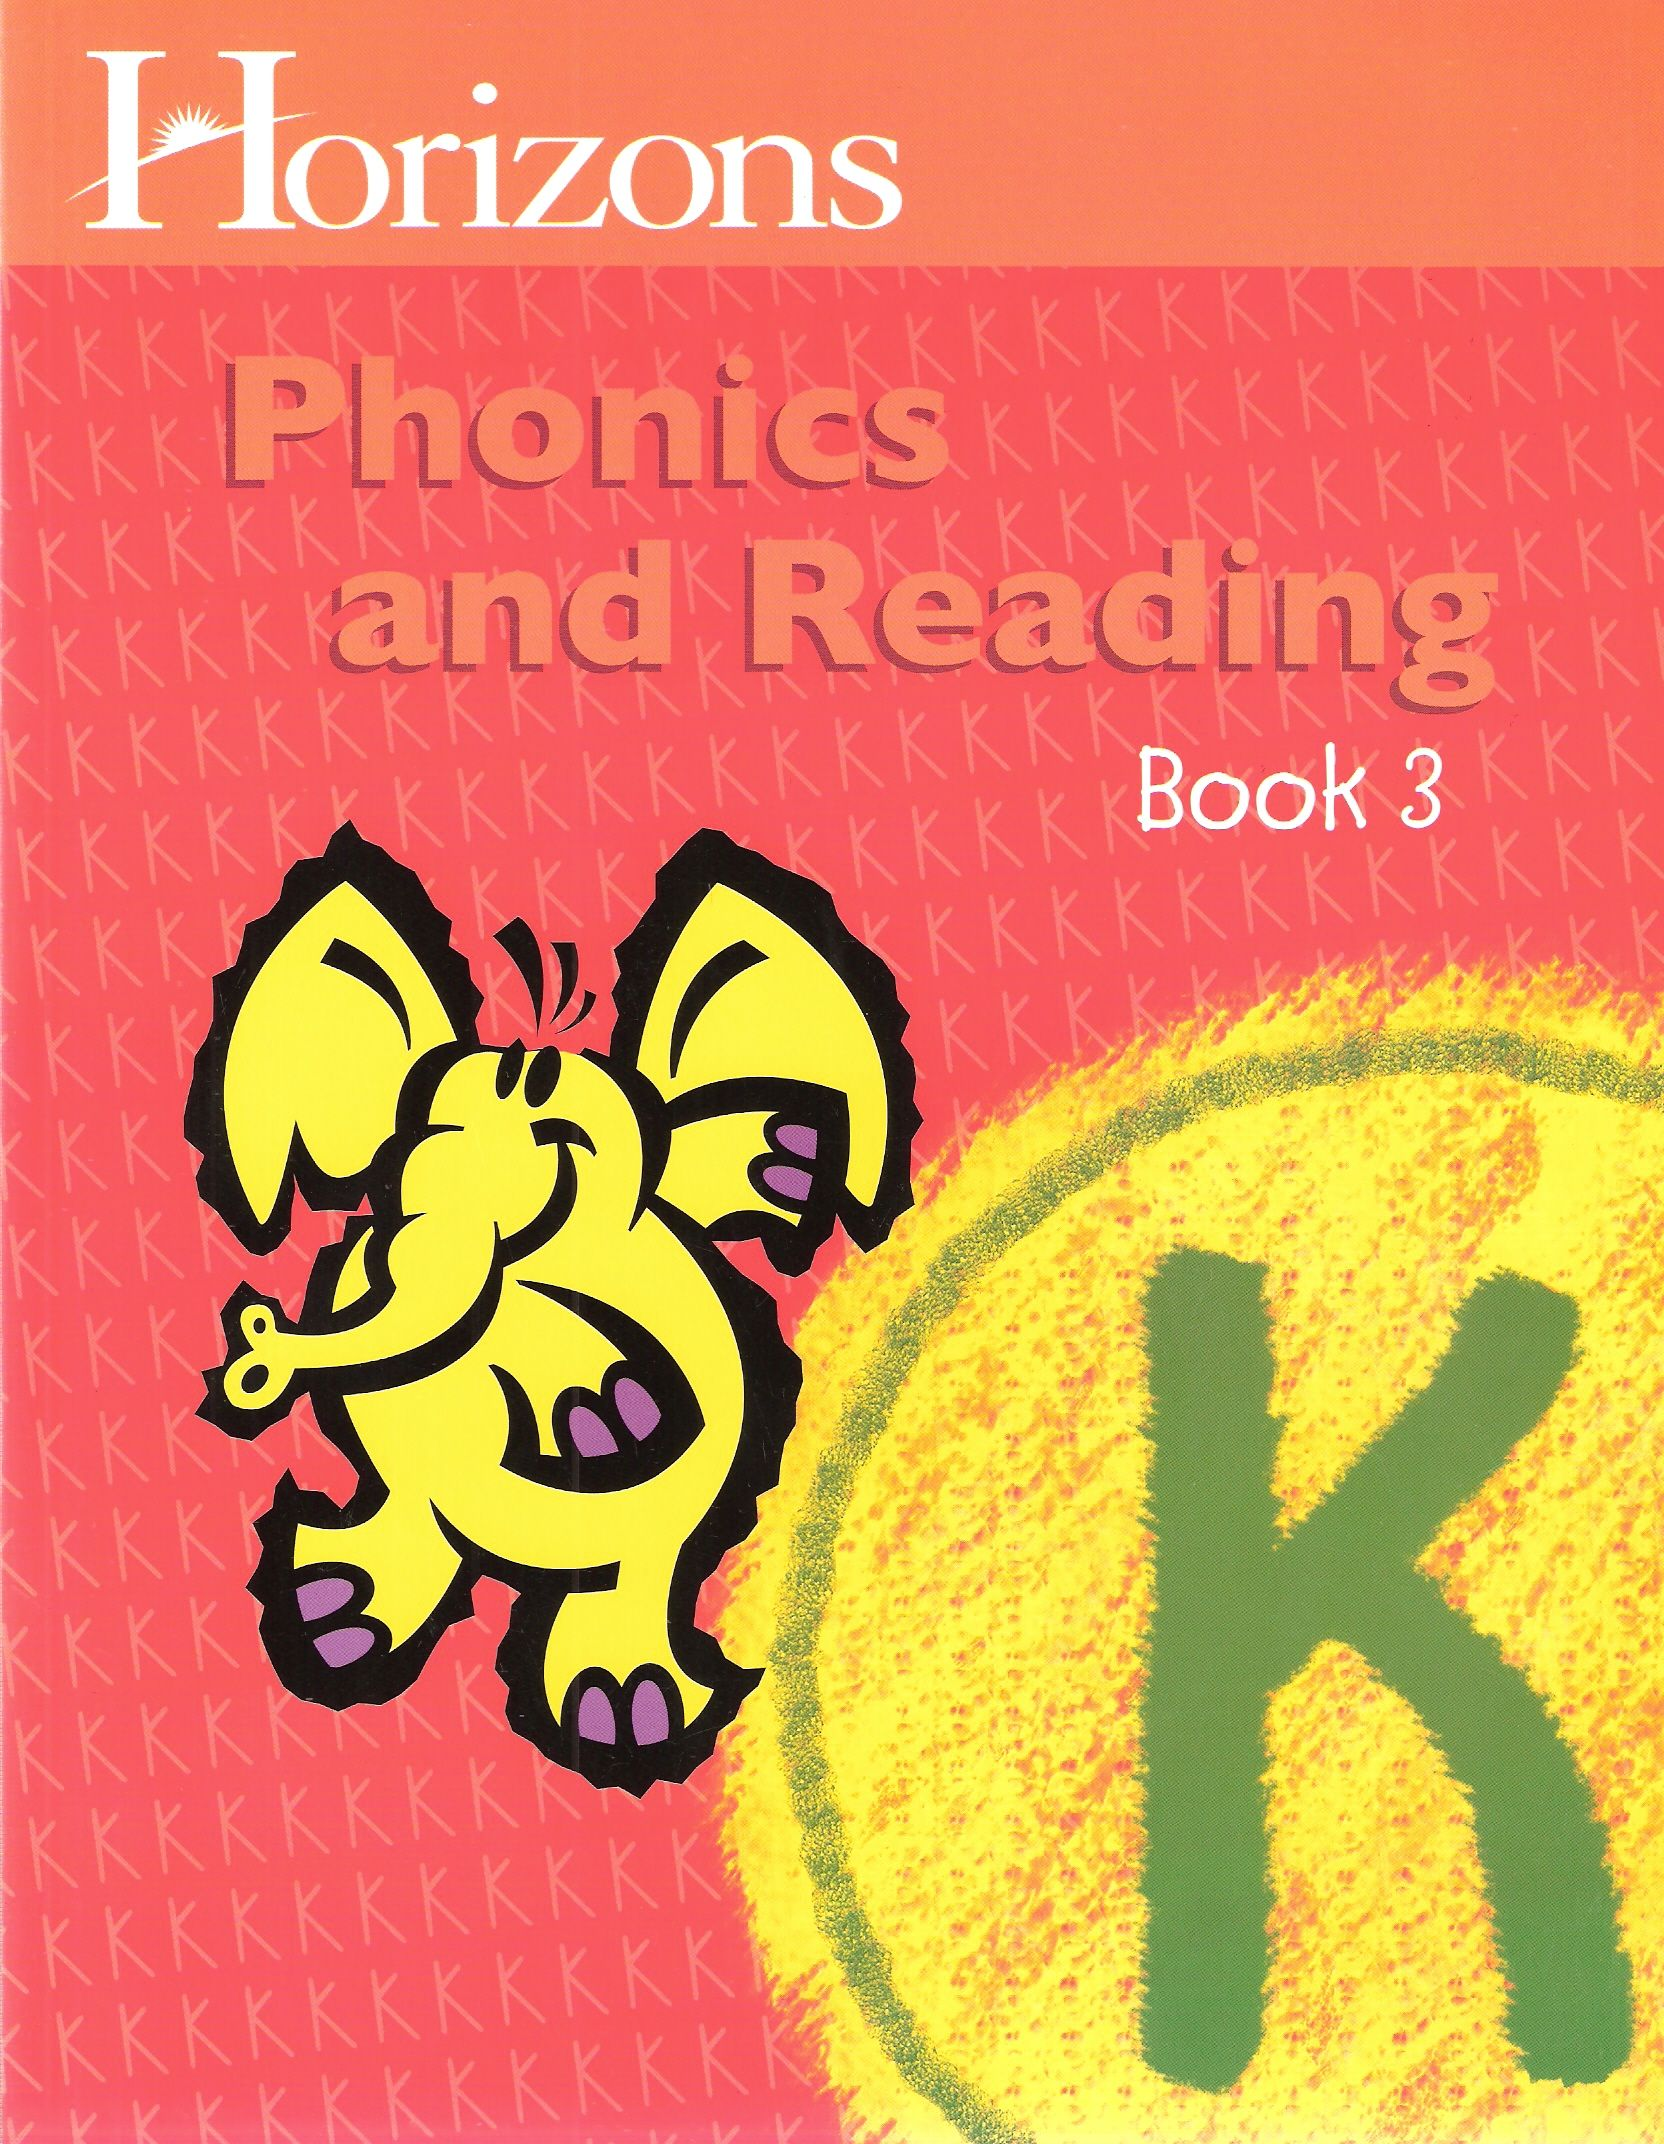 Horizons Phonics Reading Wkbk